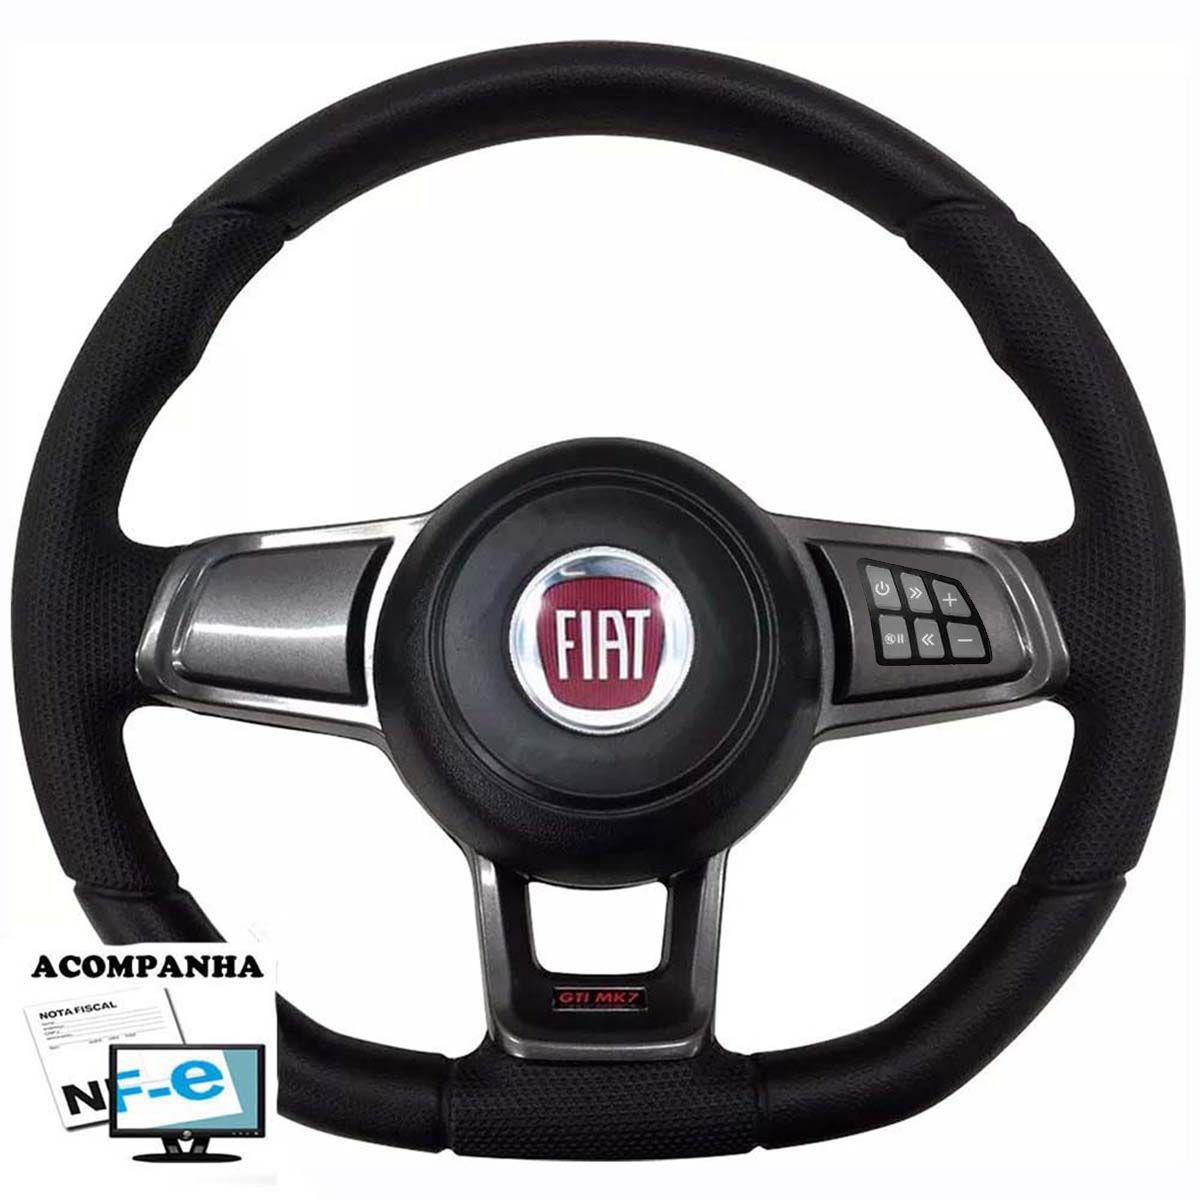 Volante Multifuncional Golf GTI Mk7 Fiat 147 Palio Uno Mille Fire Way Vivace Fiorino Elba Panorama Premio Tempra Marea Bravo Idea Somtilo Strada Aciondor de Buzina + Cubo